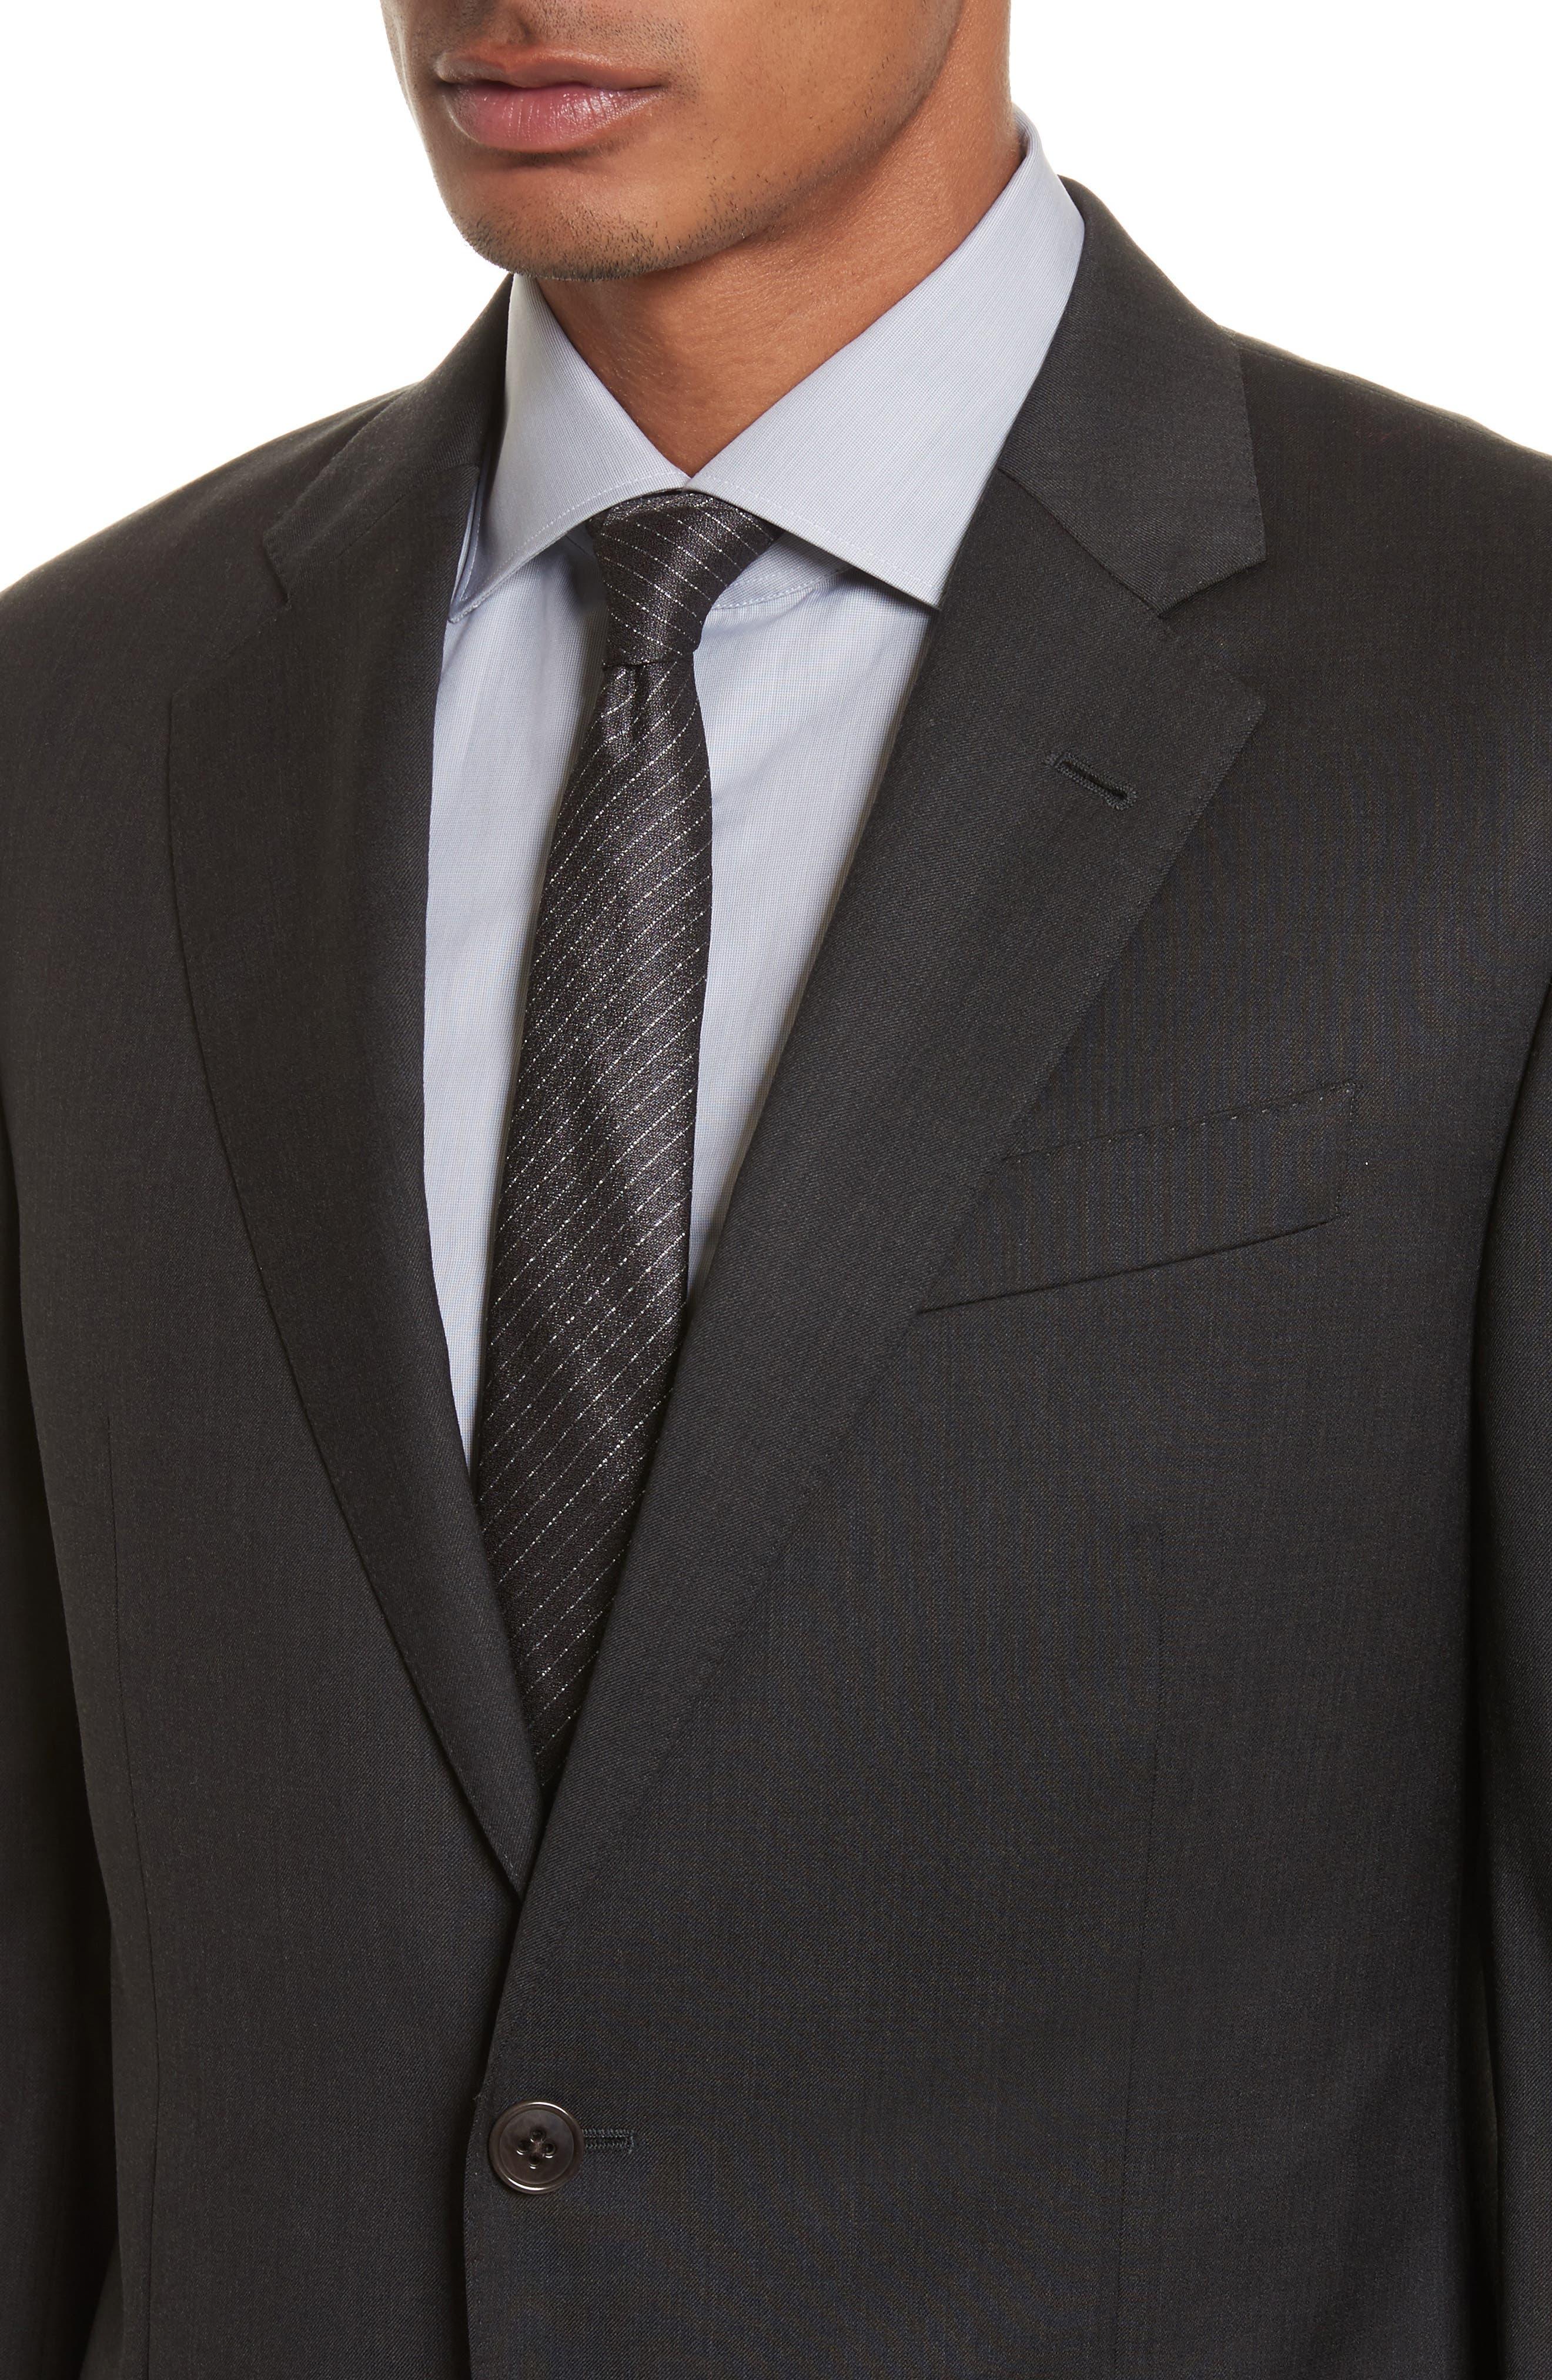 'G-Line' Trim Fit Solid Wool Suit,                             Alternate thumbnail 5, color,                             Charcoal